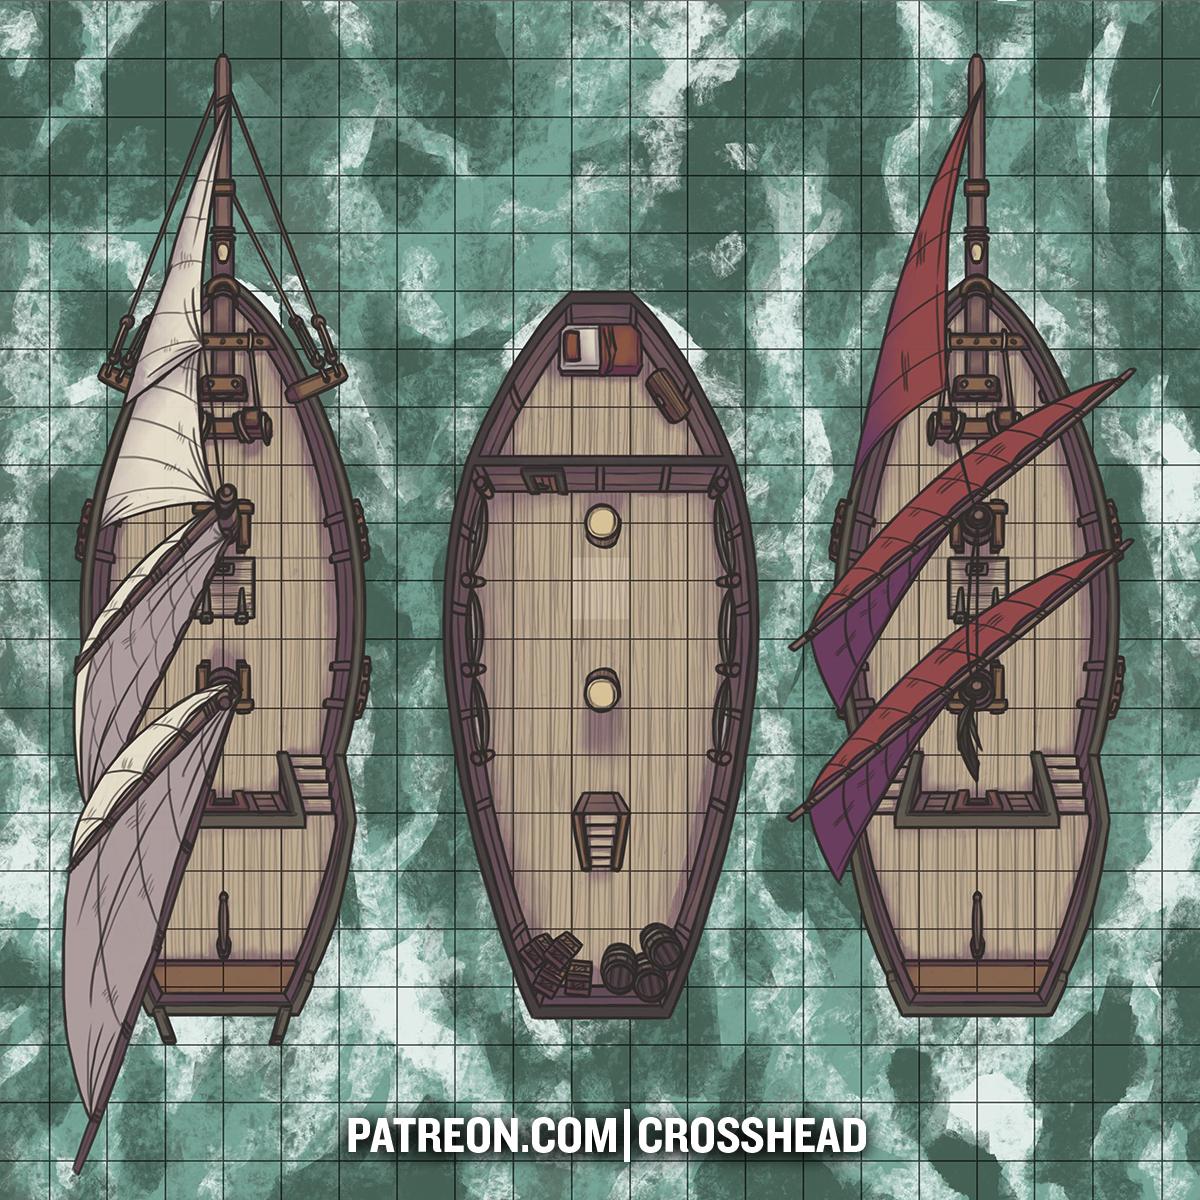 SHIPS D&D SCHOONER.jpg